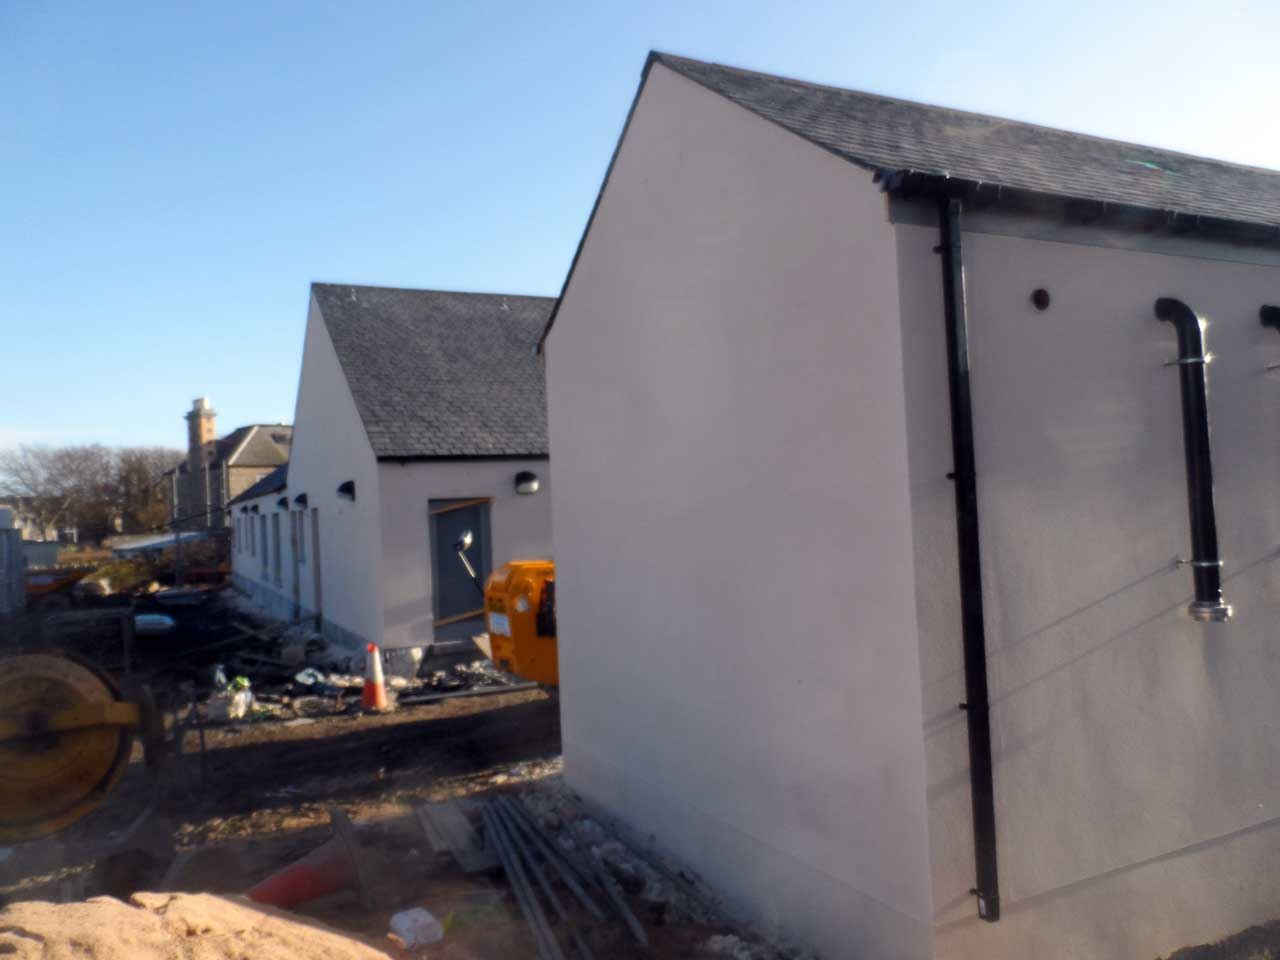 Photo: New Children's Home In Wick 2 February 2014